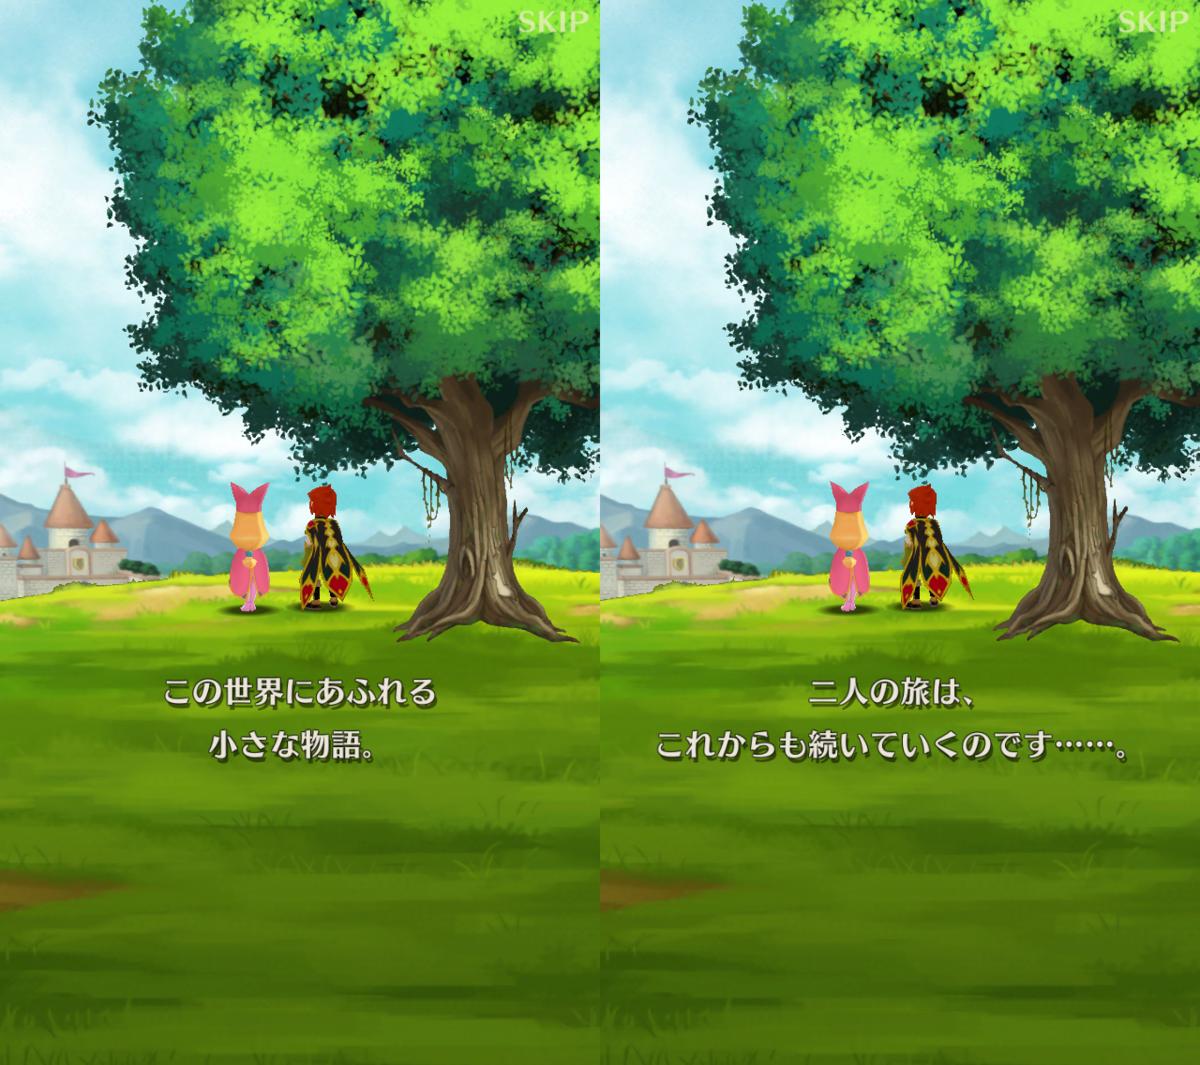 f:id:saki_yukino:20200514011850p:plain